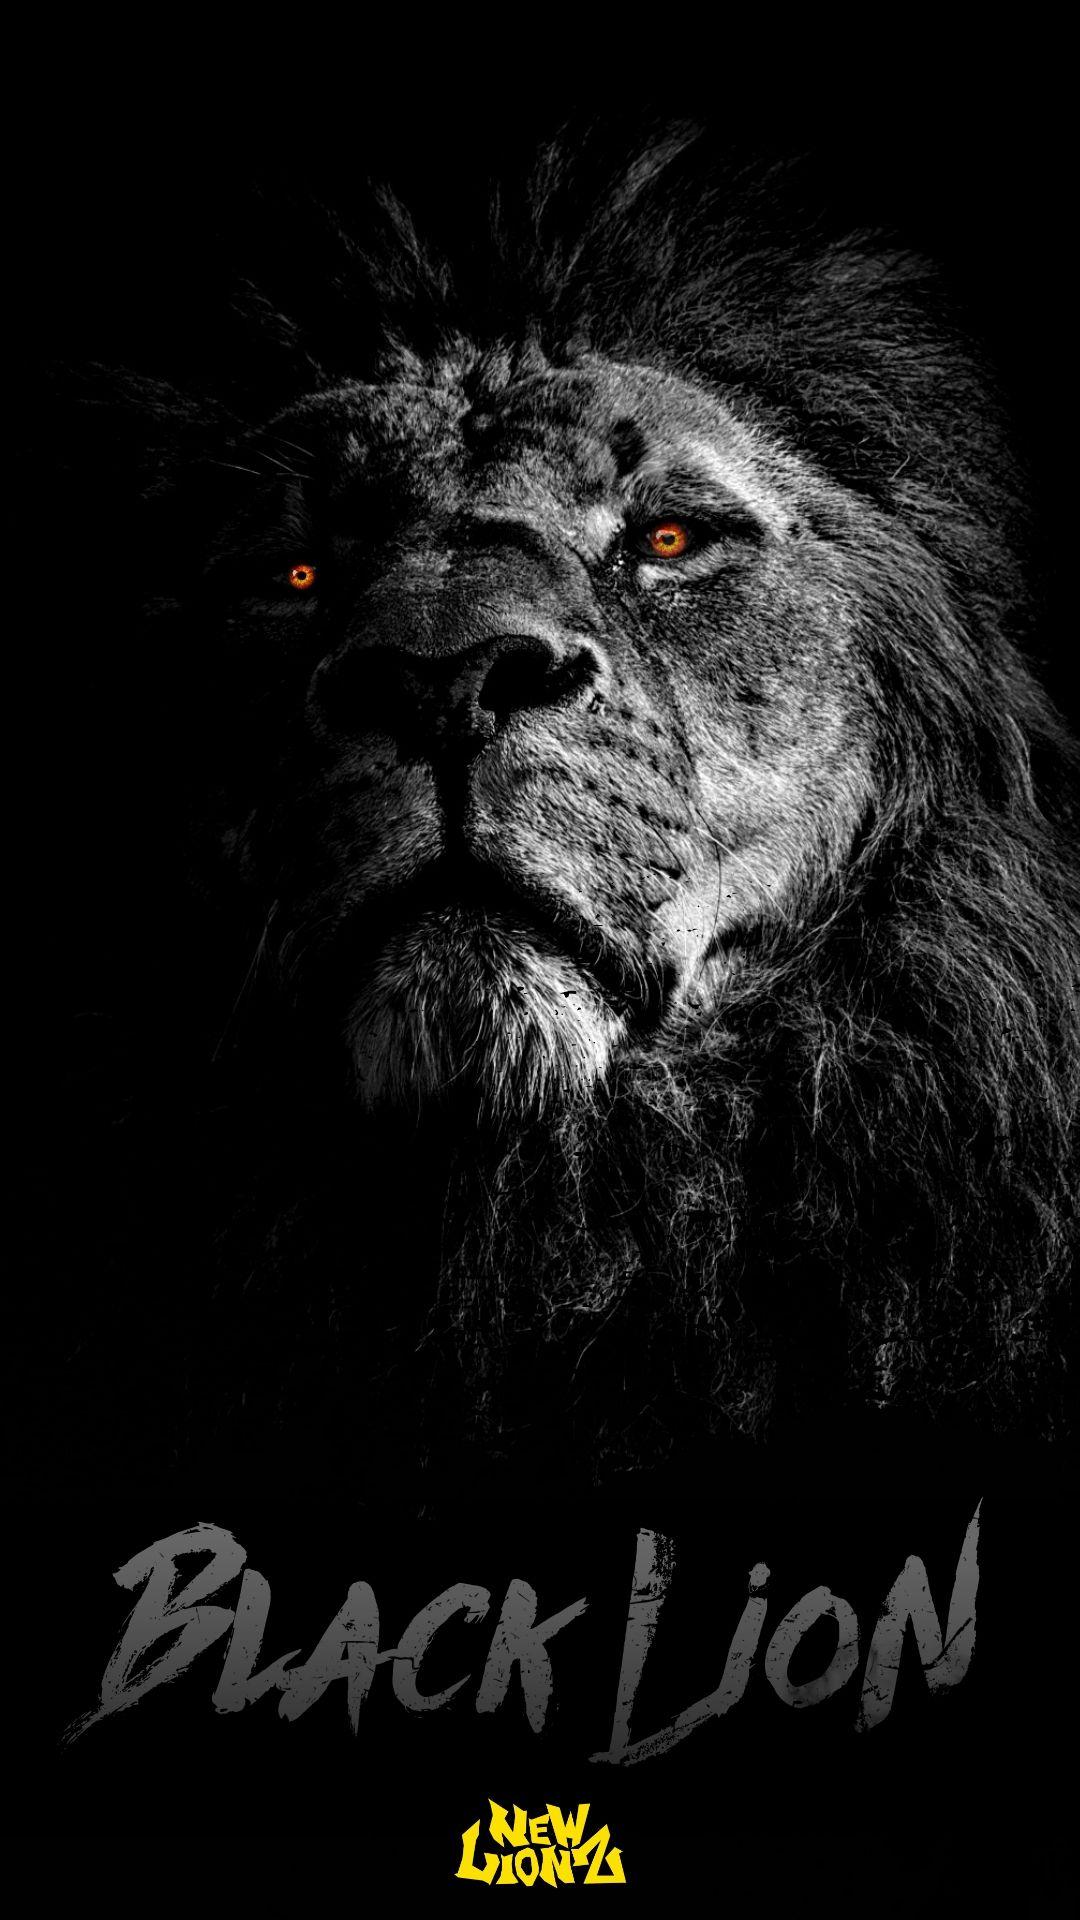 Black Lion Newlionz Iphone Android Wallpaper In 2021 Lion Artwork Lion Wallpaper Lion Pictures